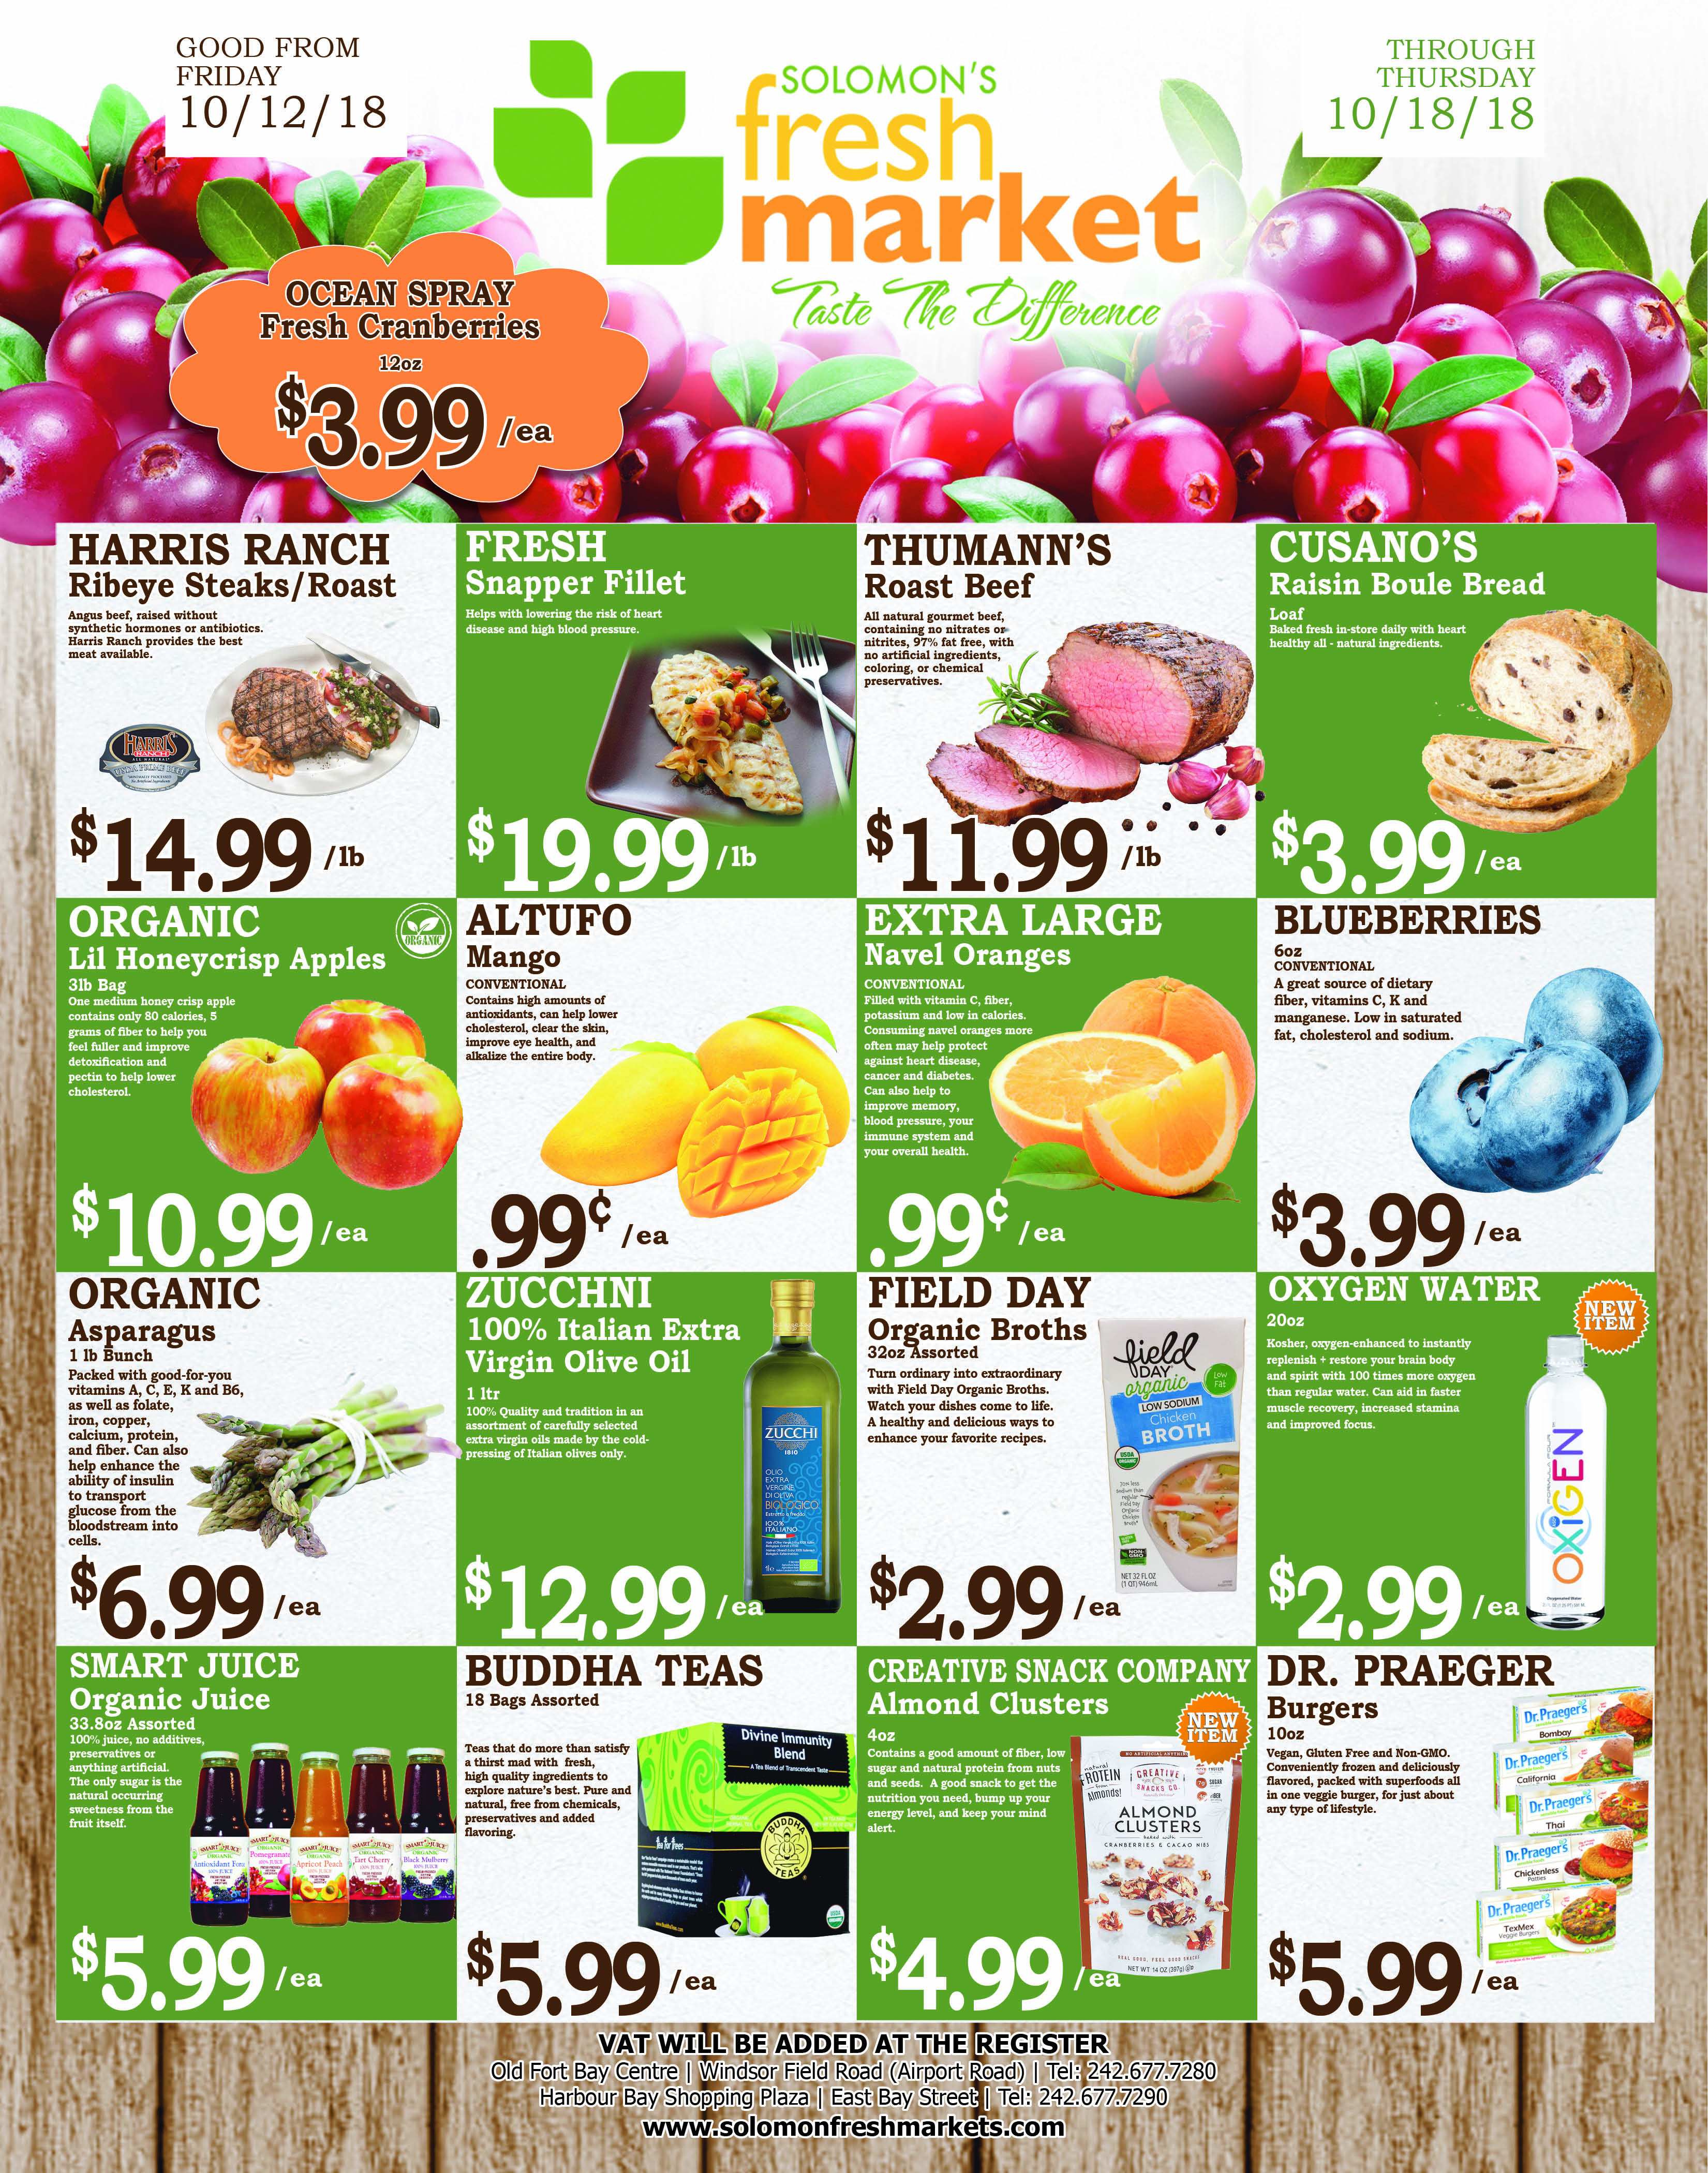 Solomons Fresh Market. Weekly Savings!